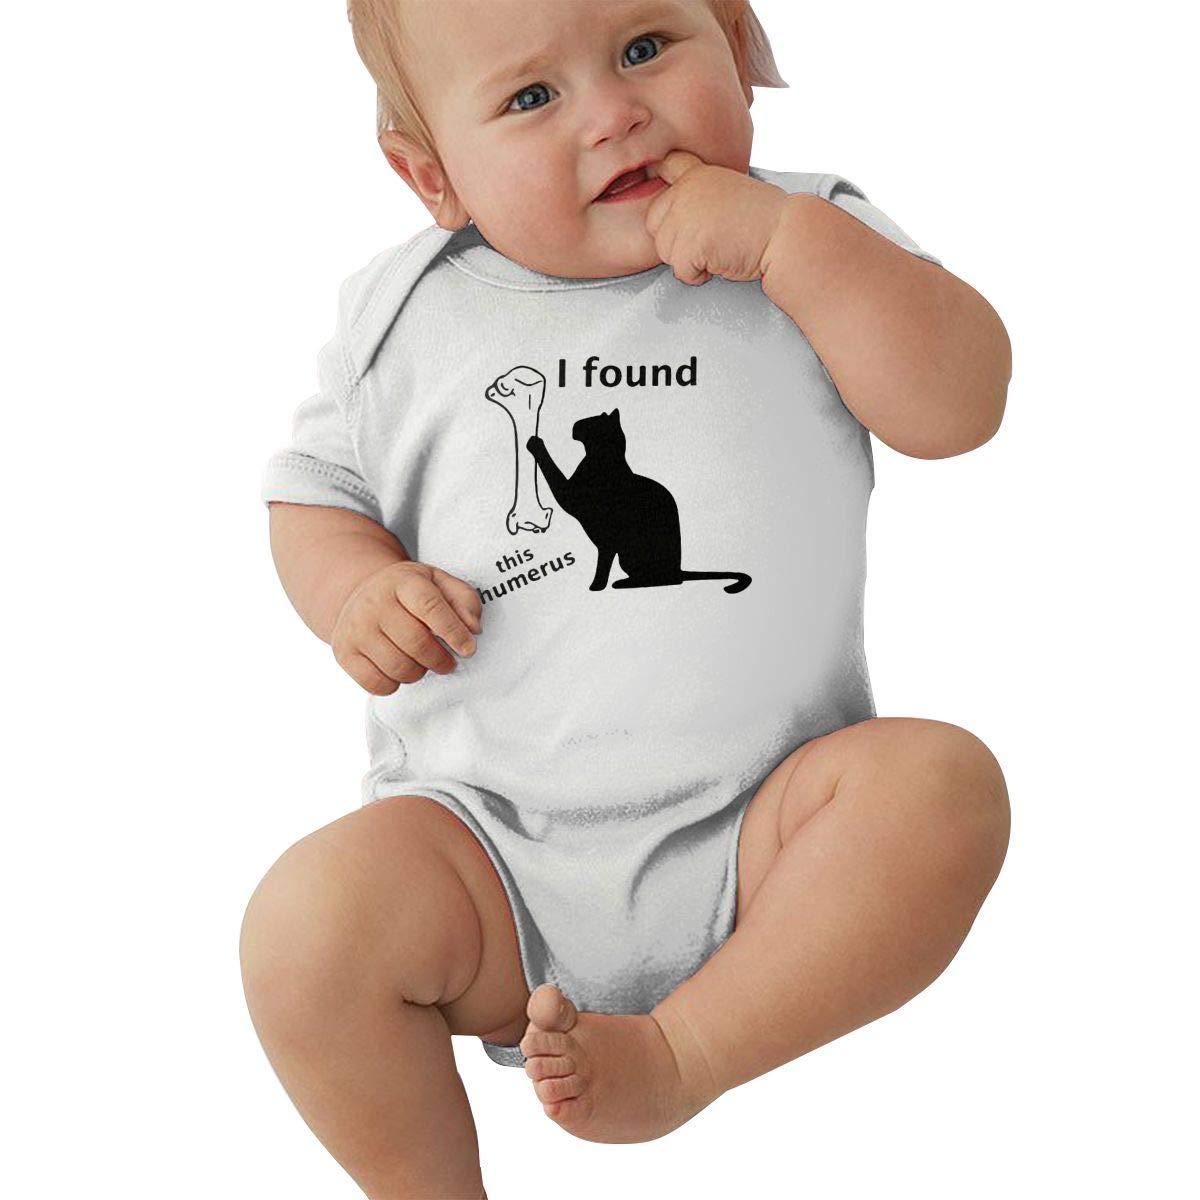 Mri-le2 Newborn Baby Short Sleeve Organic Bodysuit I Found This Humerus Infant Romper Jumpsuit